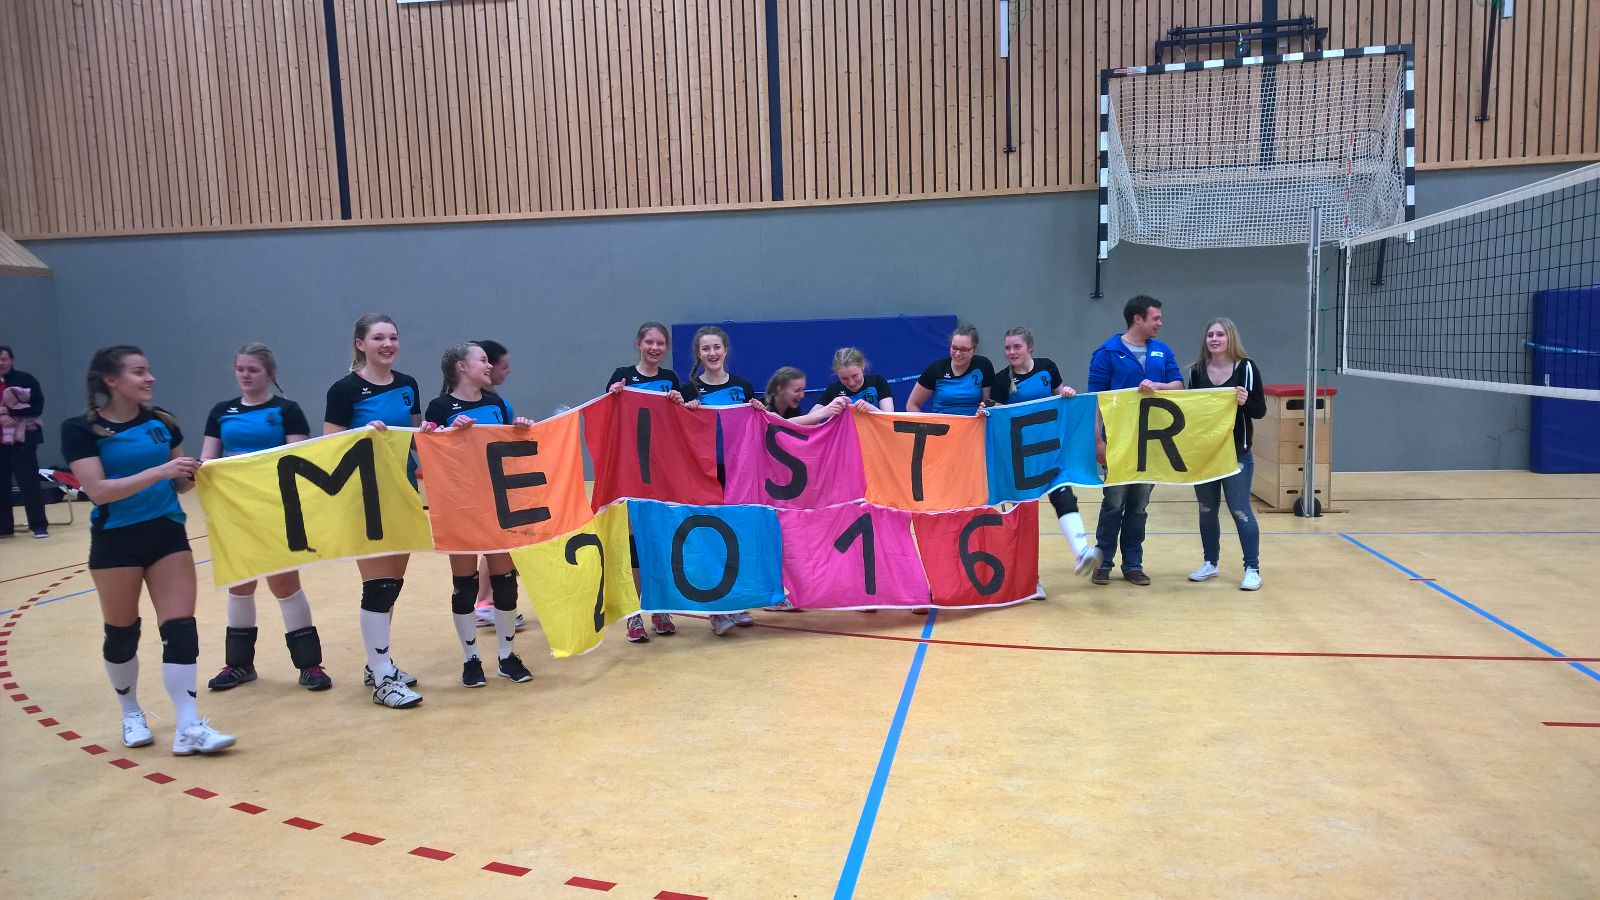 4-Damen Meister 2016